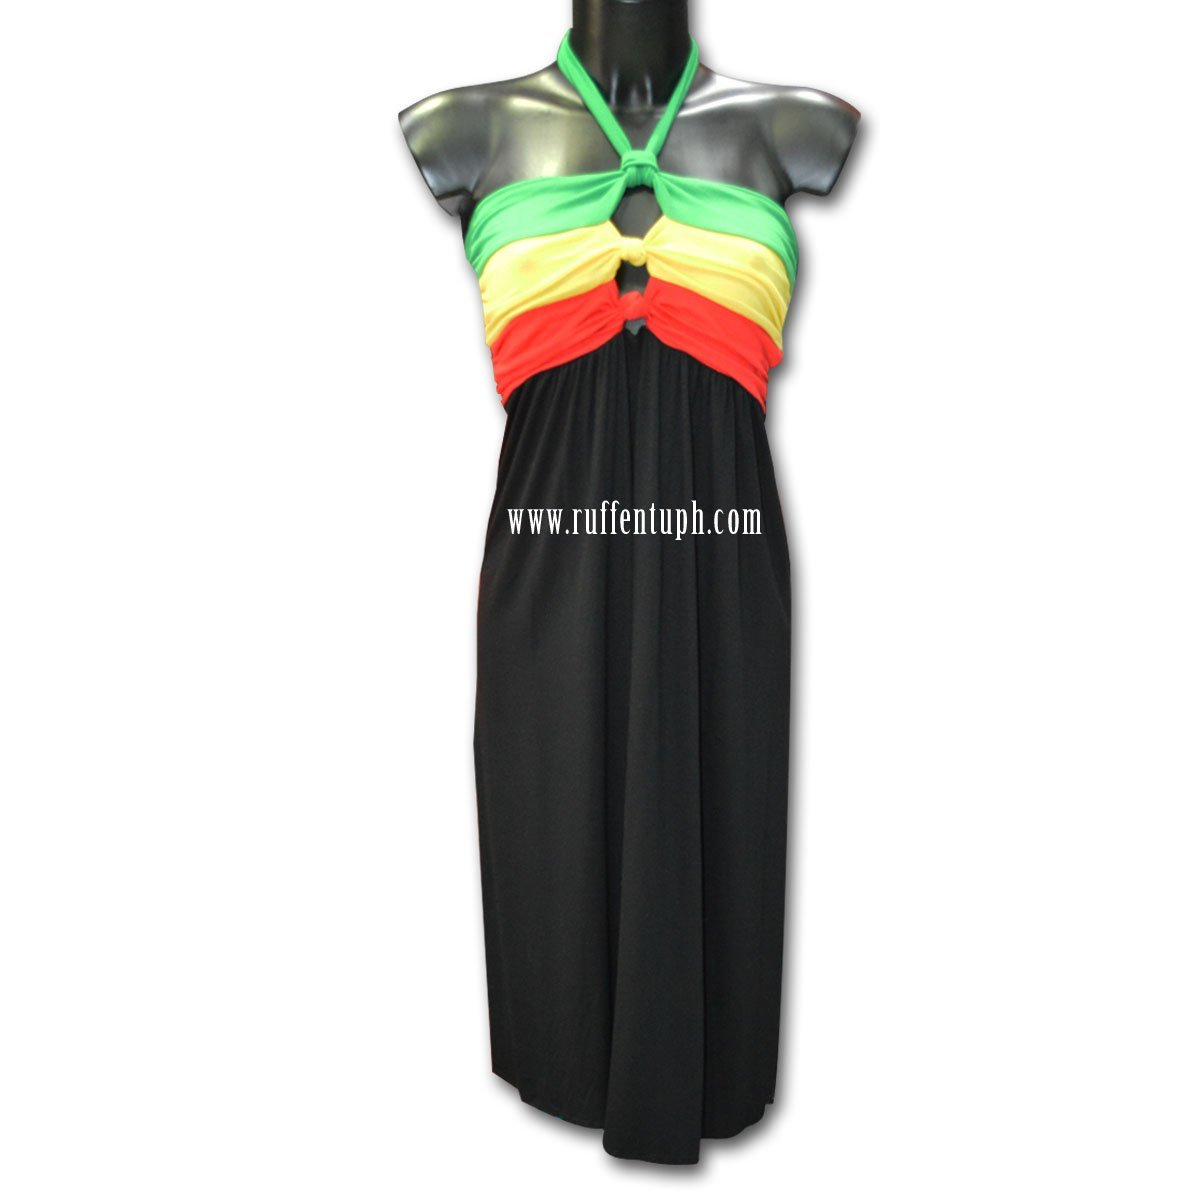 Ruffentuph Vestido de Noche Rasta de – Correa de Rasta Cuello para – 2 Styles en 1 – Talla única 4258f7